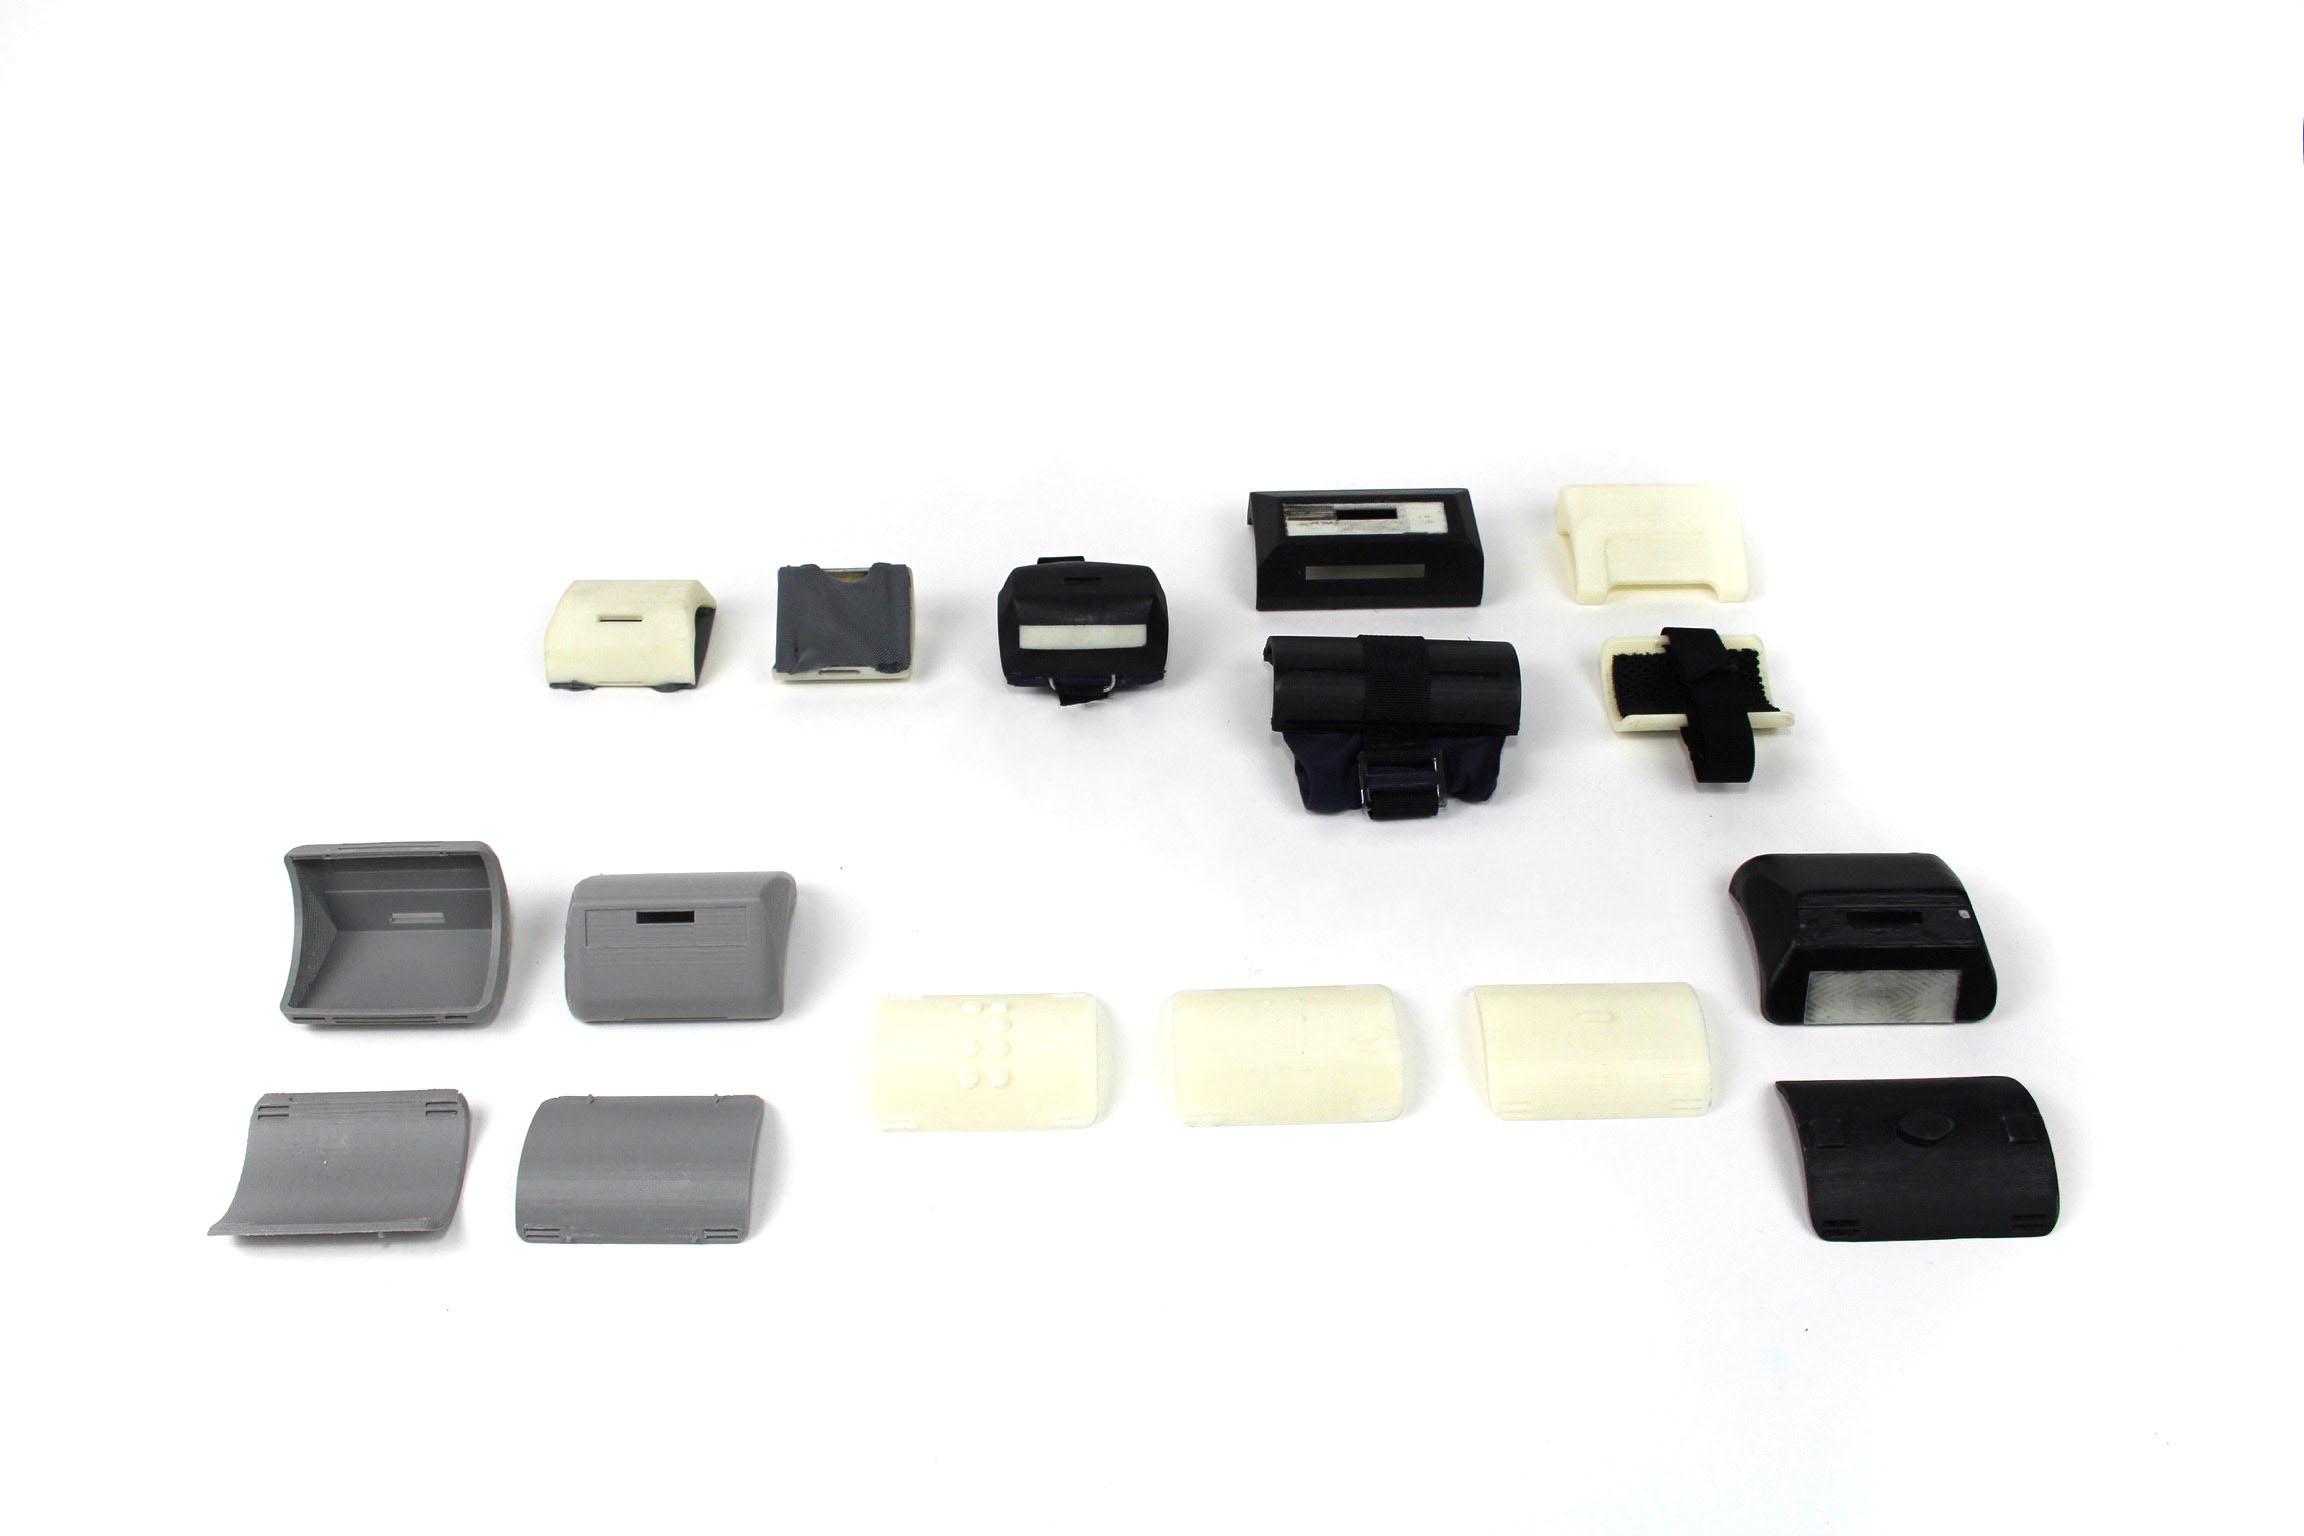 all prototypes.jpg